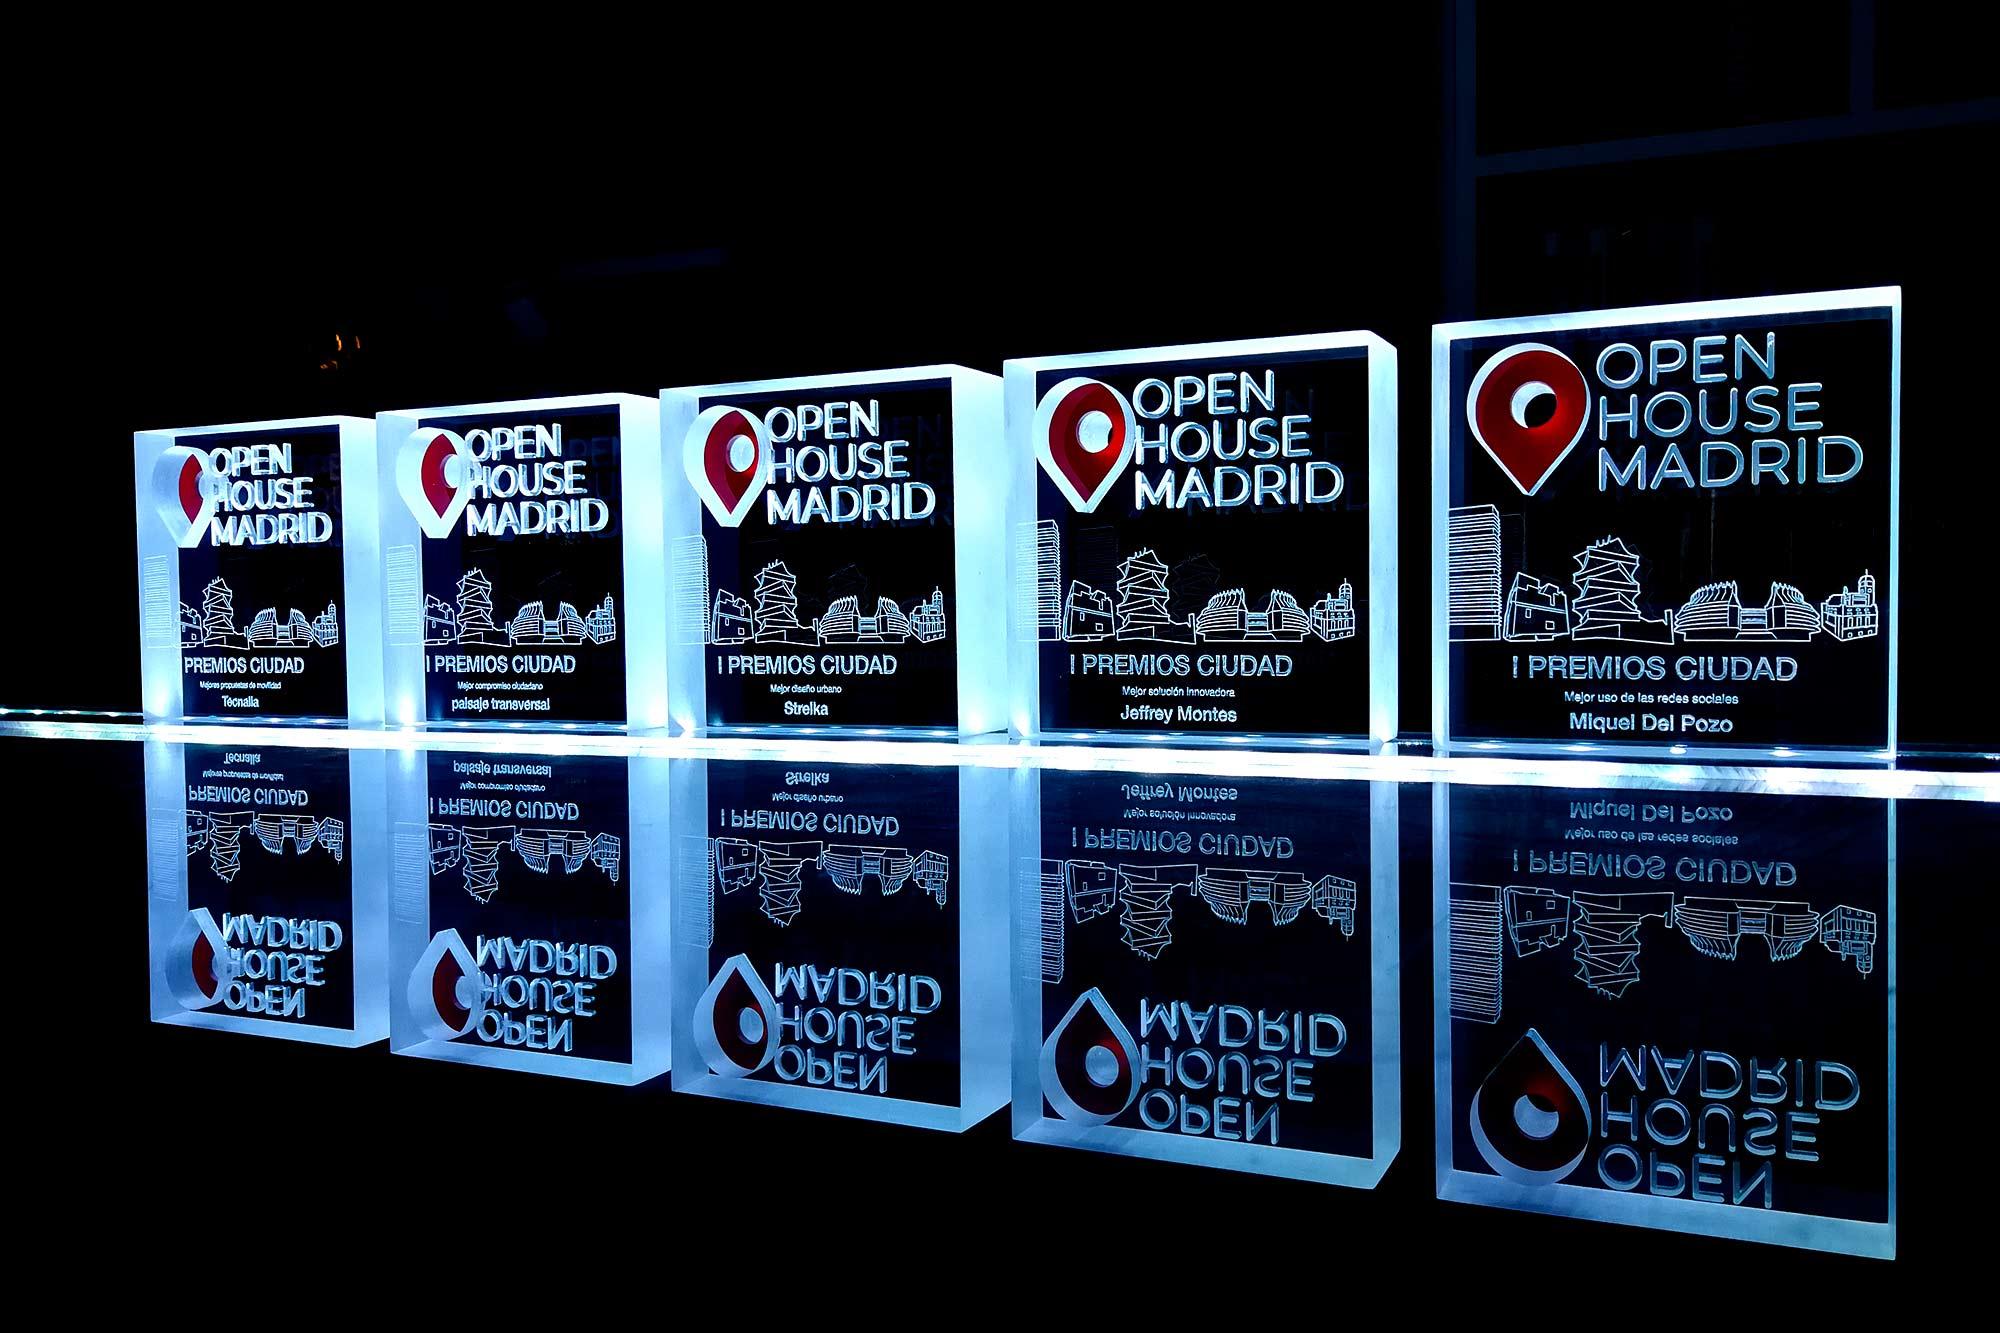 Premios-Ciudad_-Open-House-Madrid_-Diseño-_-EXarchitects_06